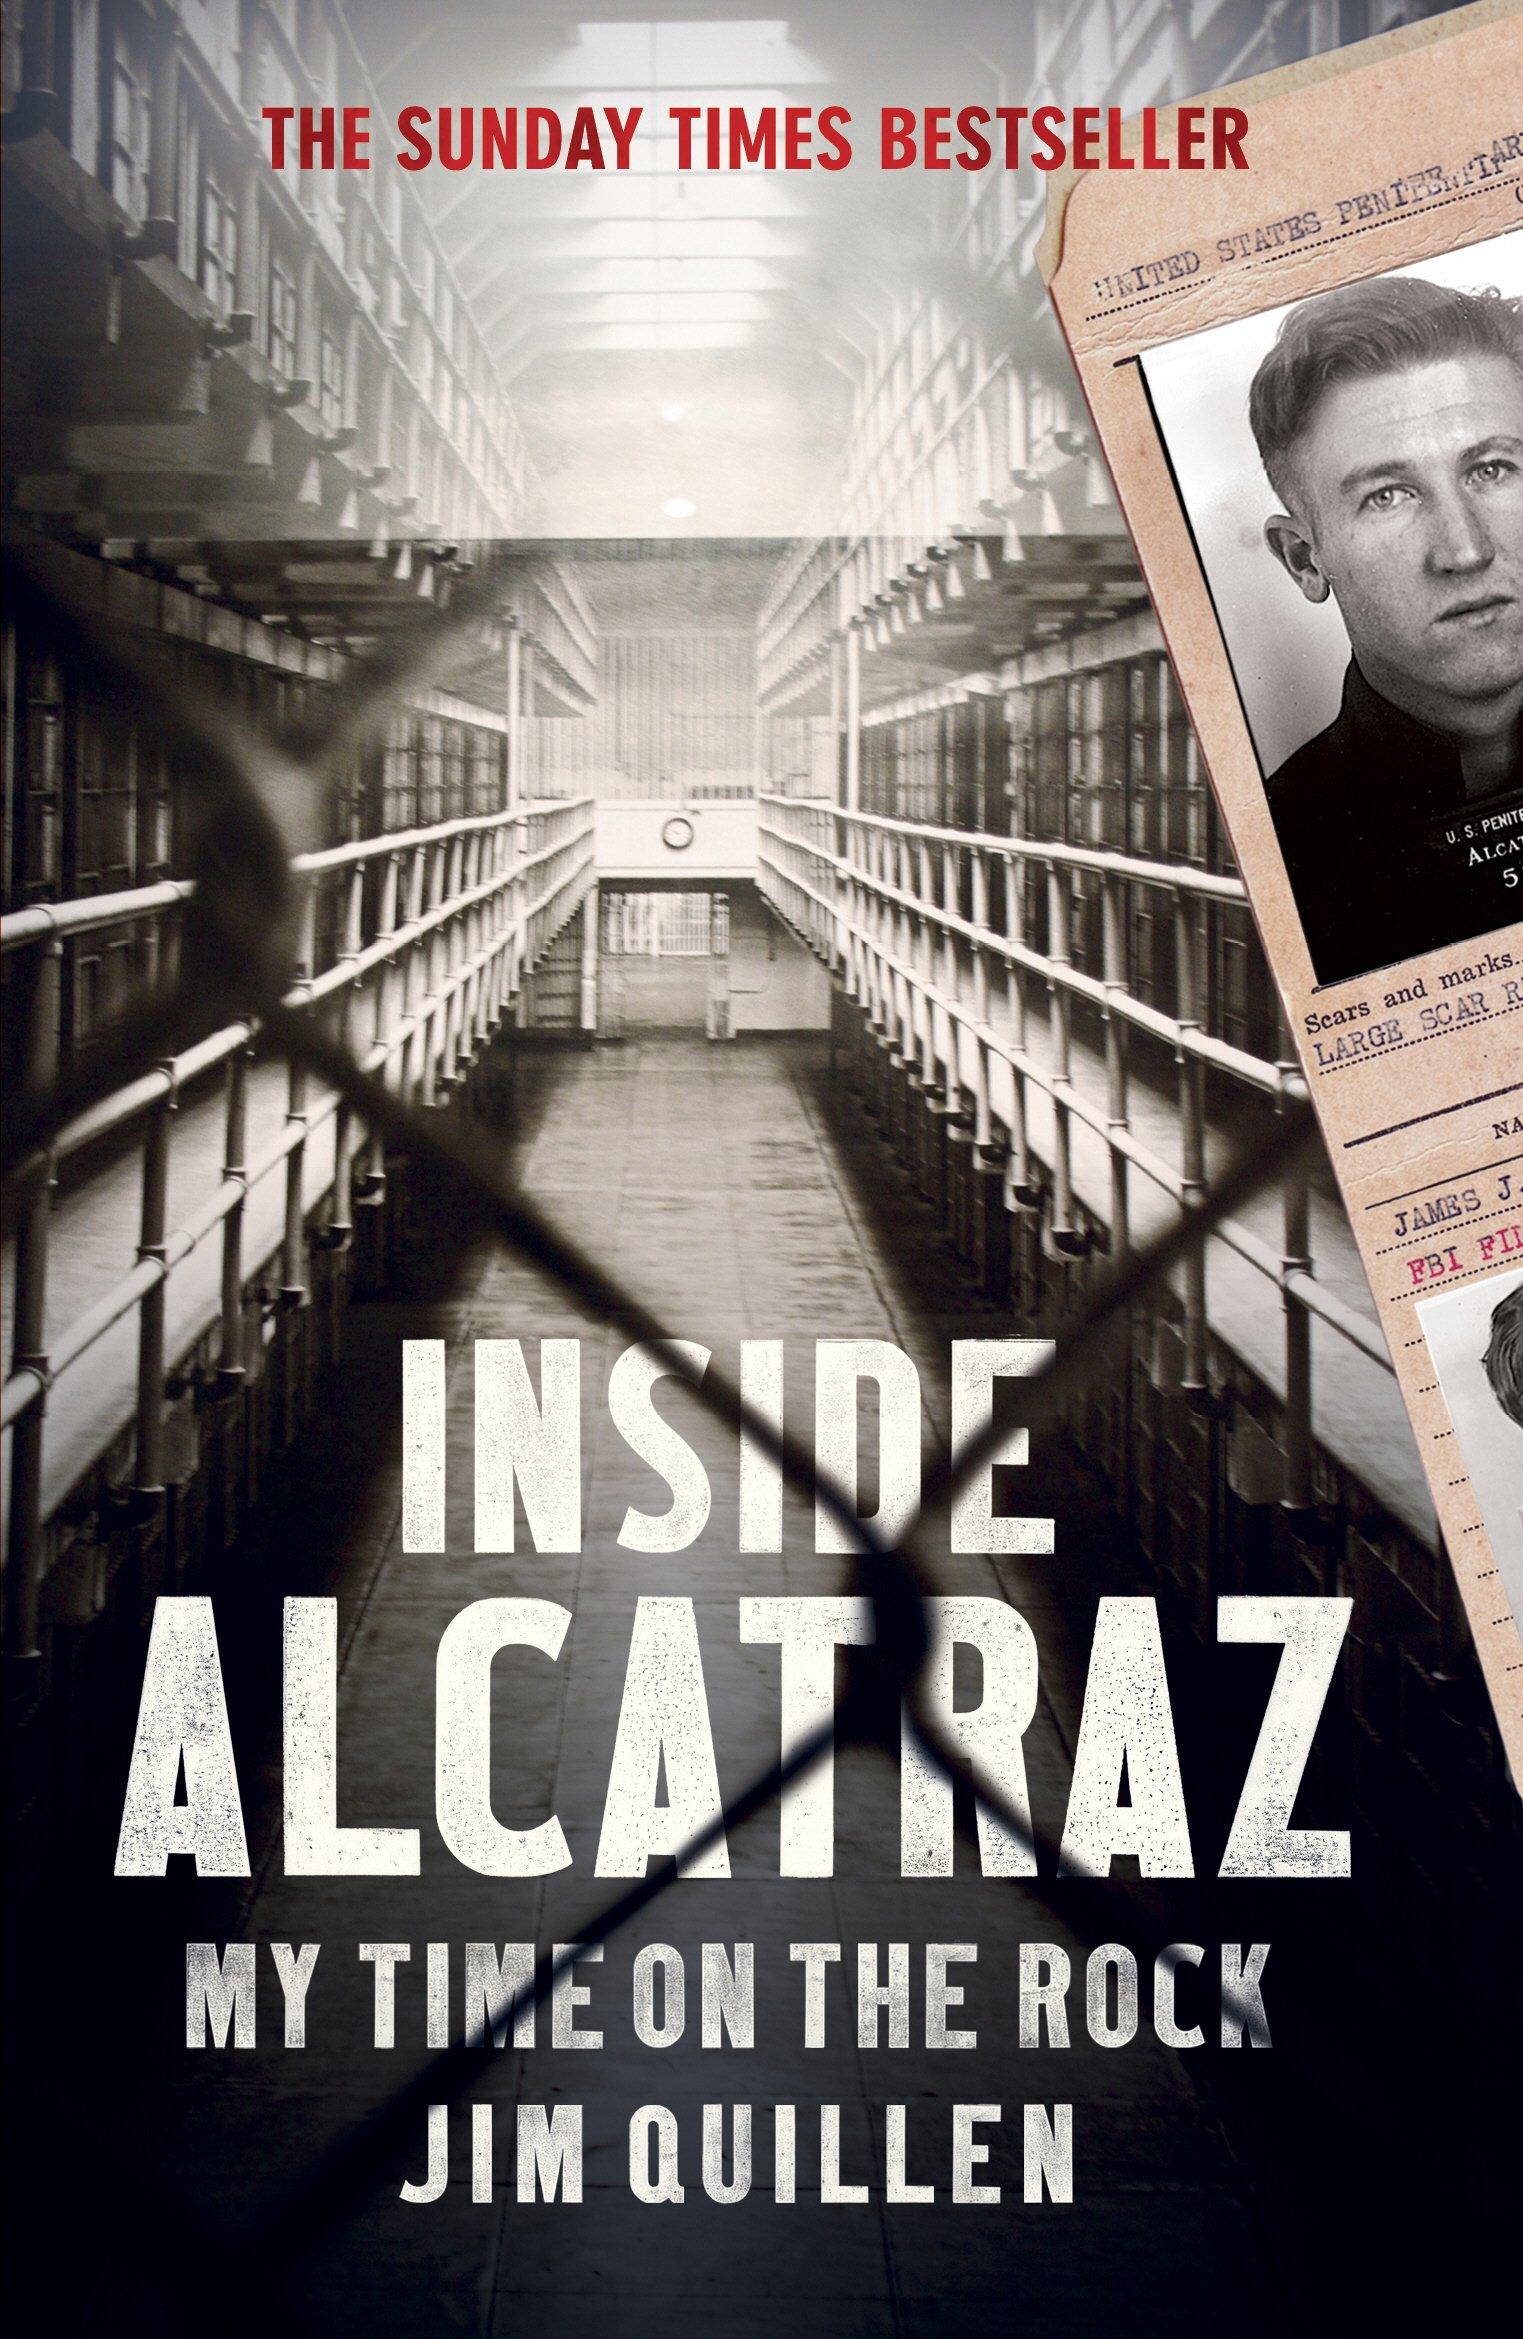 Inside Alcatraz: My Time on the Rock Paperback – January 26, 2016 Jim Quillen Random House UK 1784750662 Criminals & Outlaws